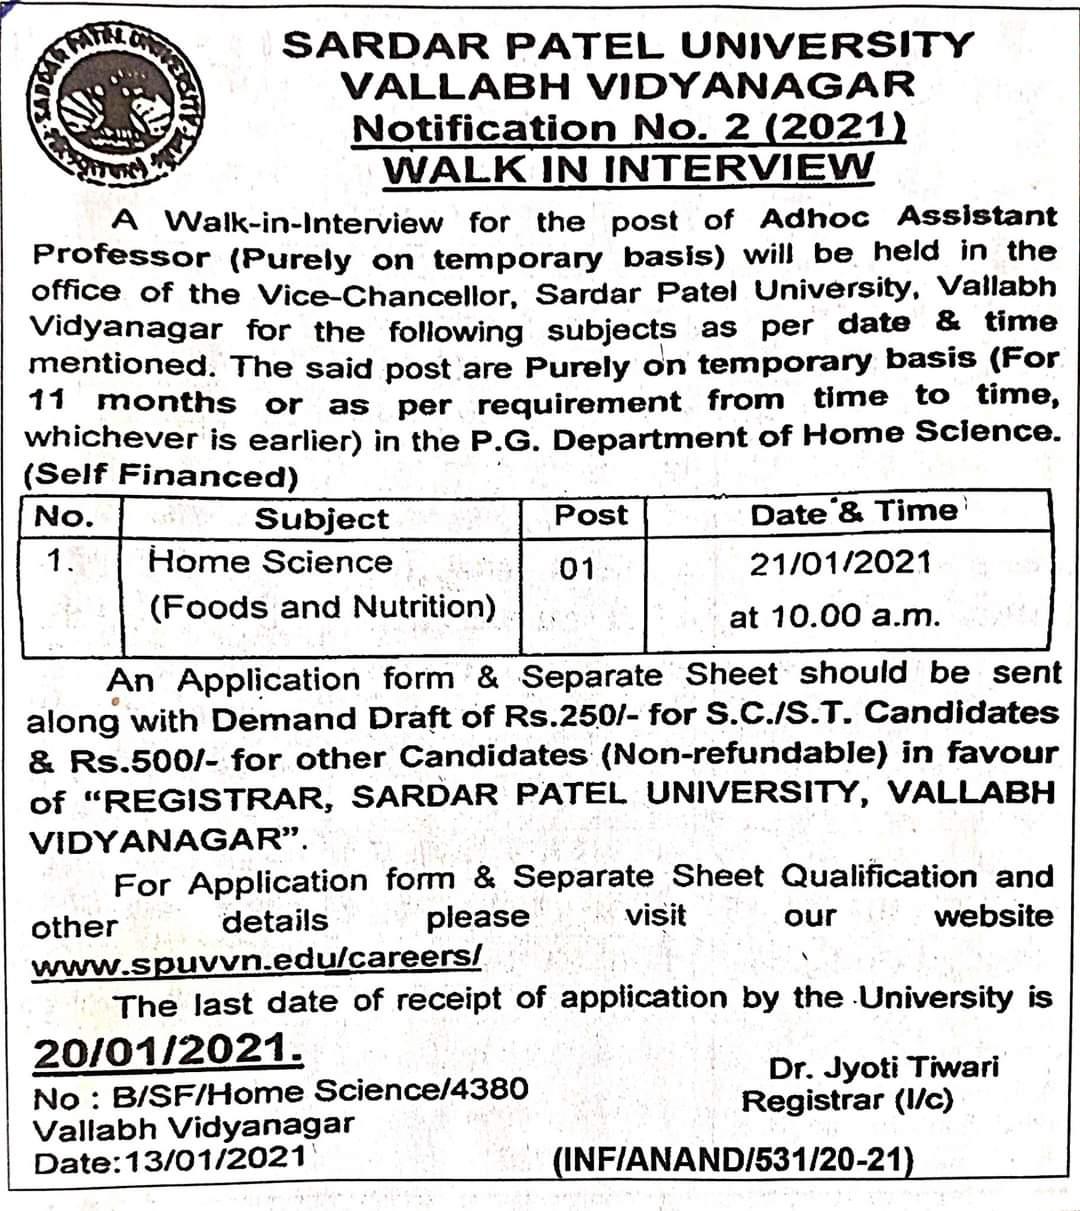 Sardar Patel University Vallabh Vidyanagr Recruitment 2021